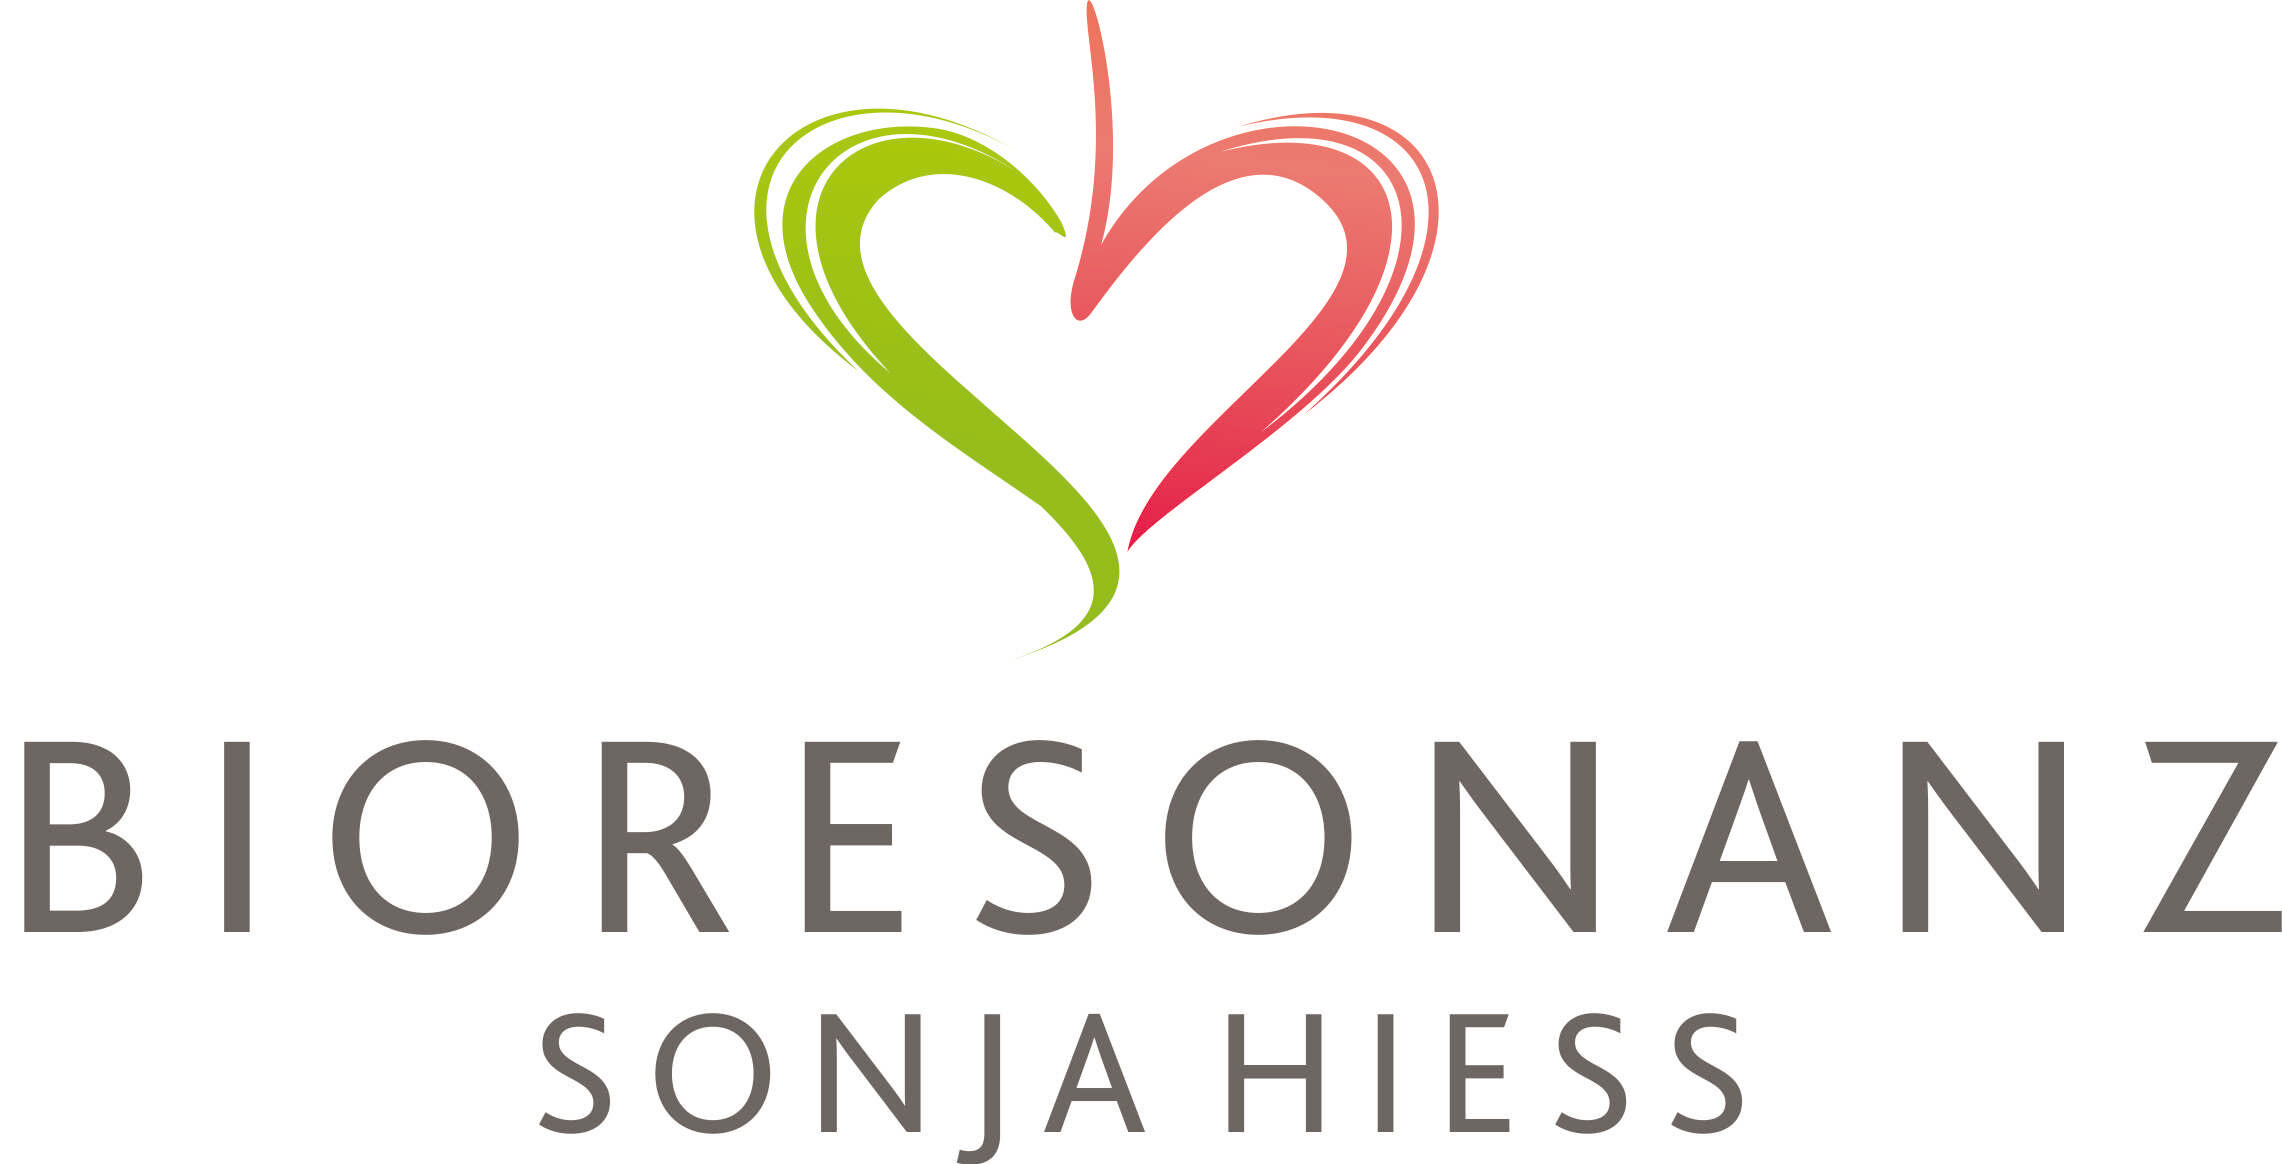 Bioresonanz Sonja Hiess